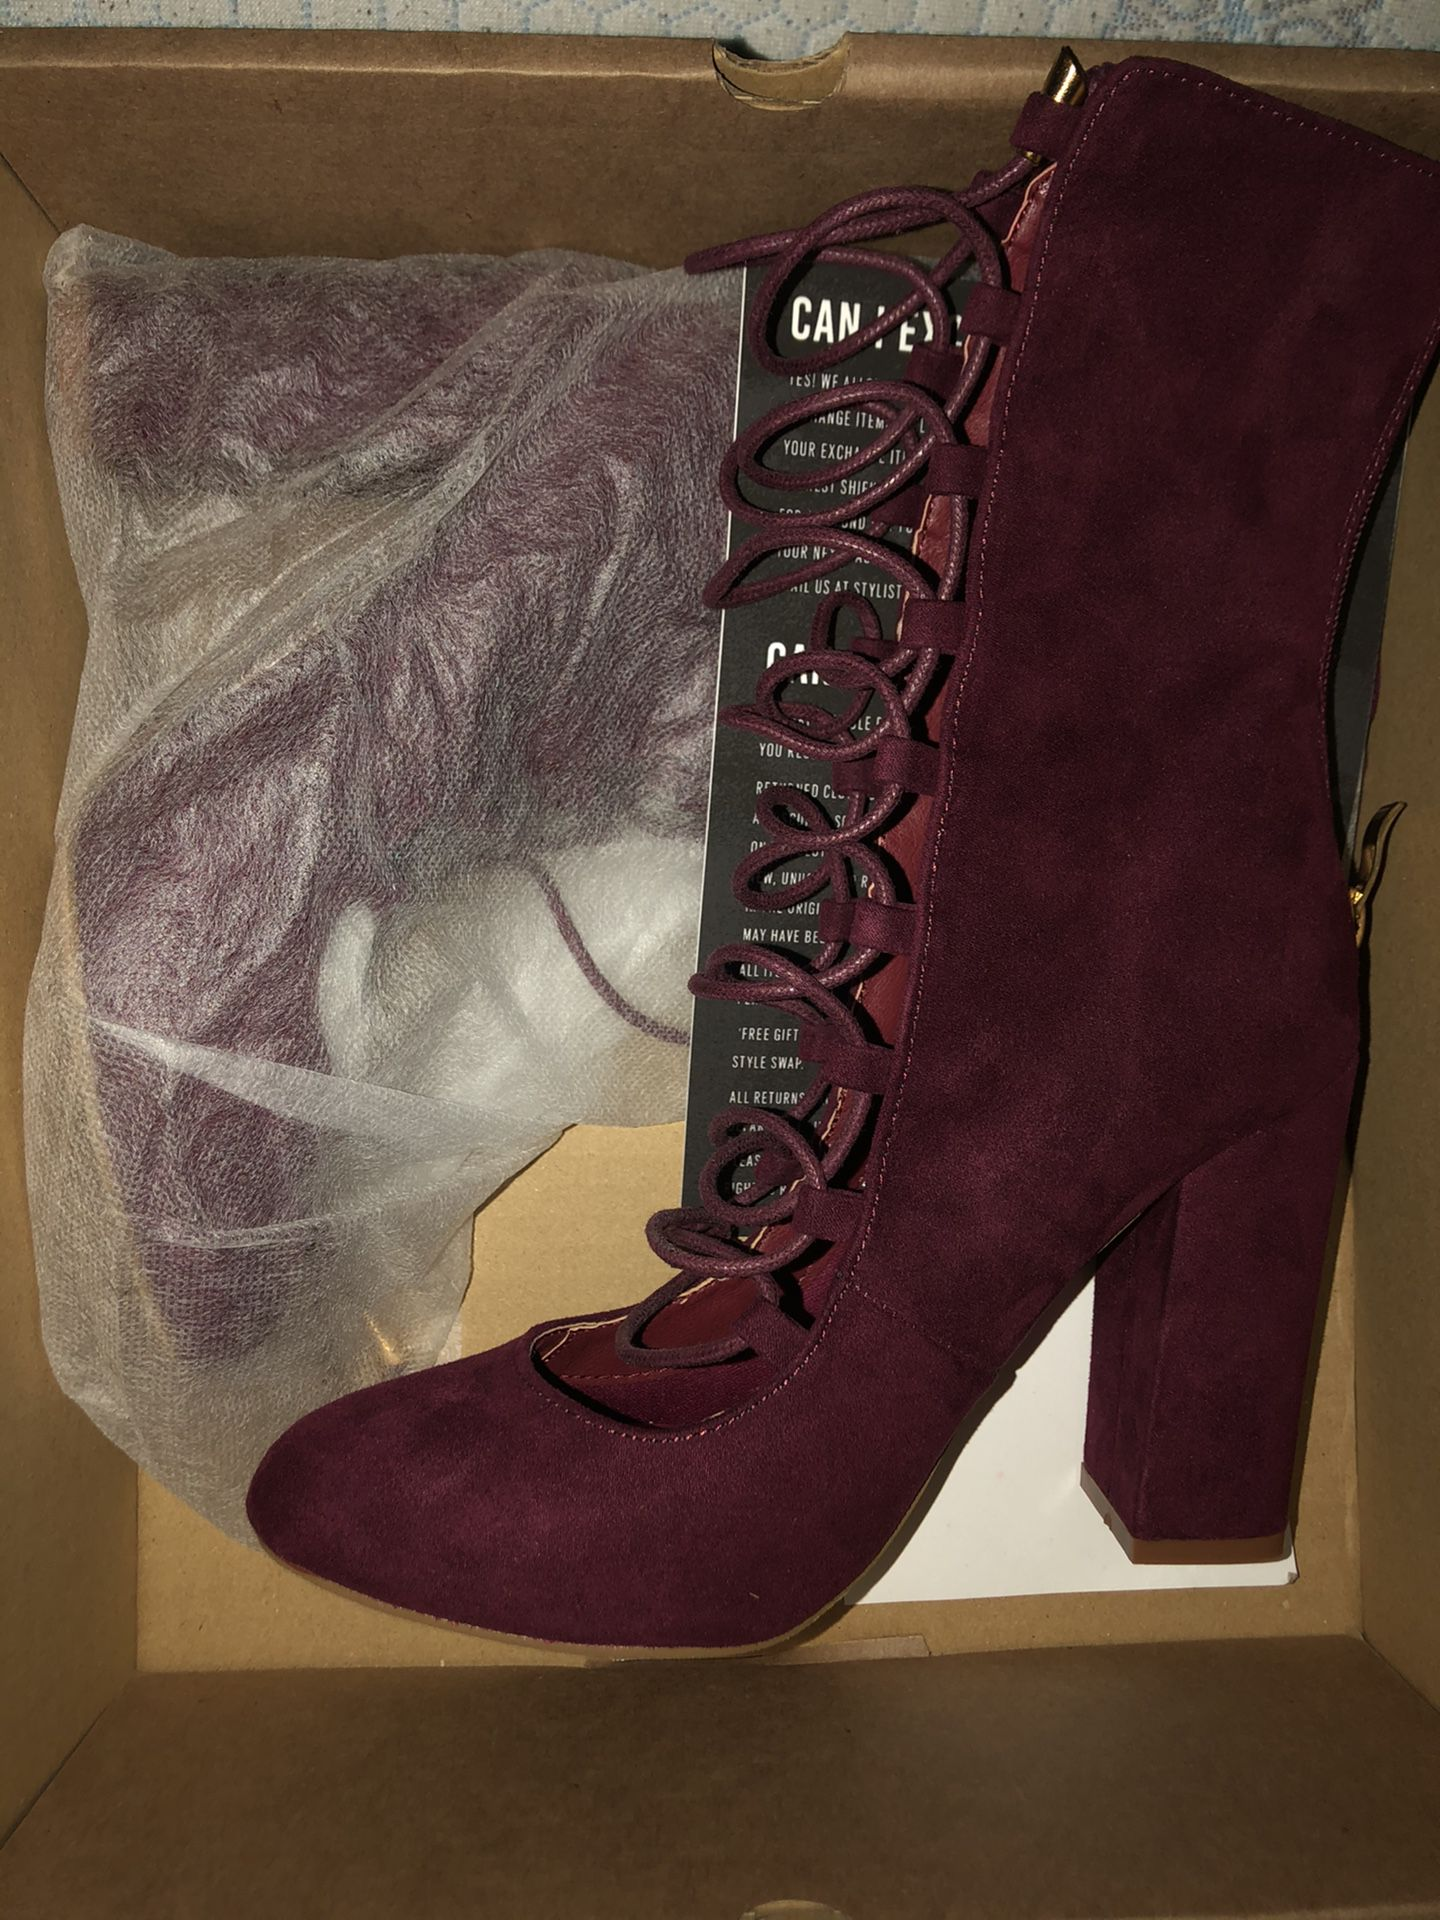 women's heels BRAND NEW size 7 $20